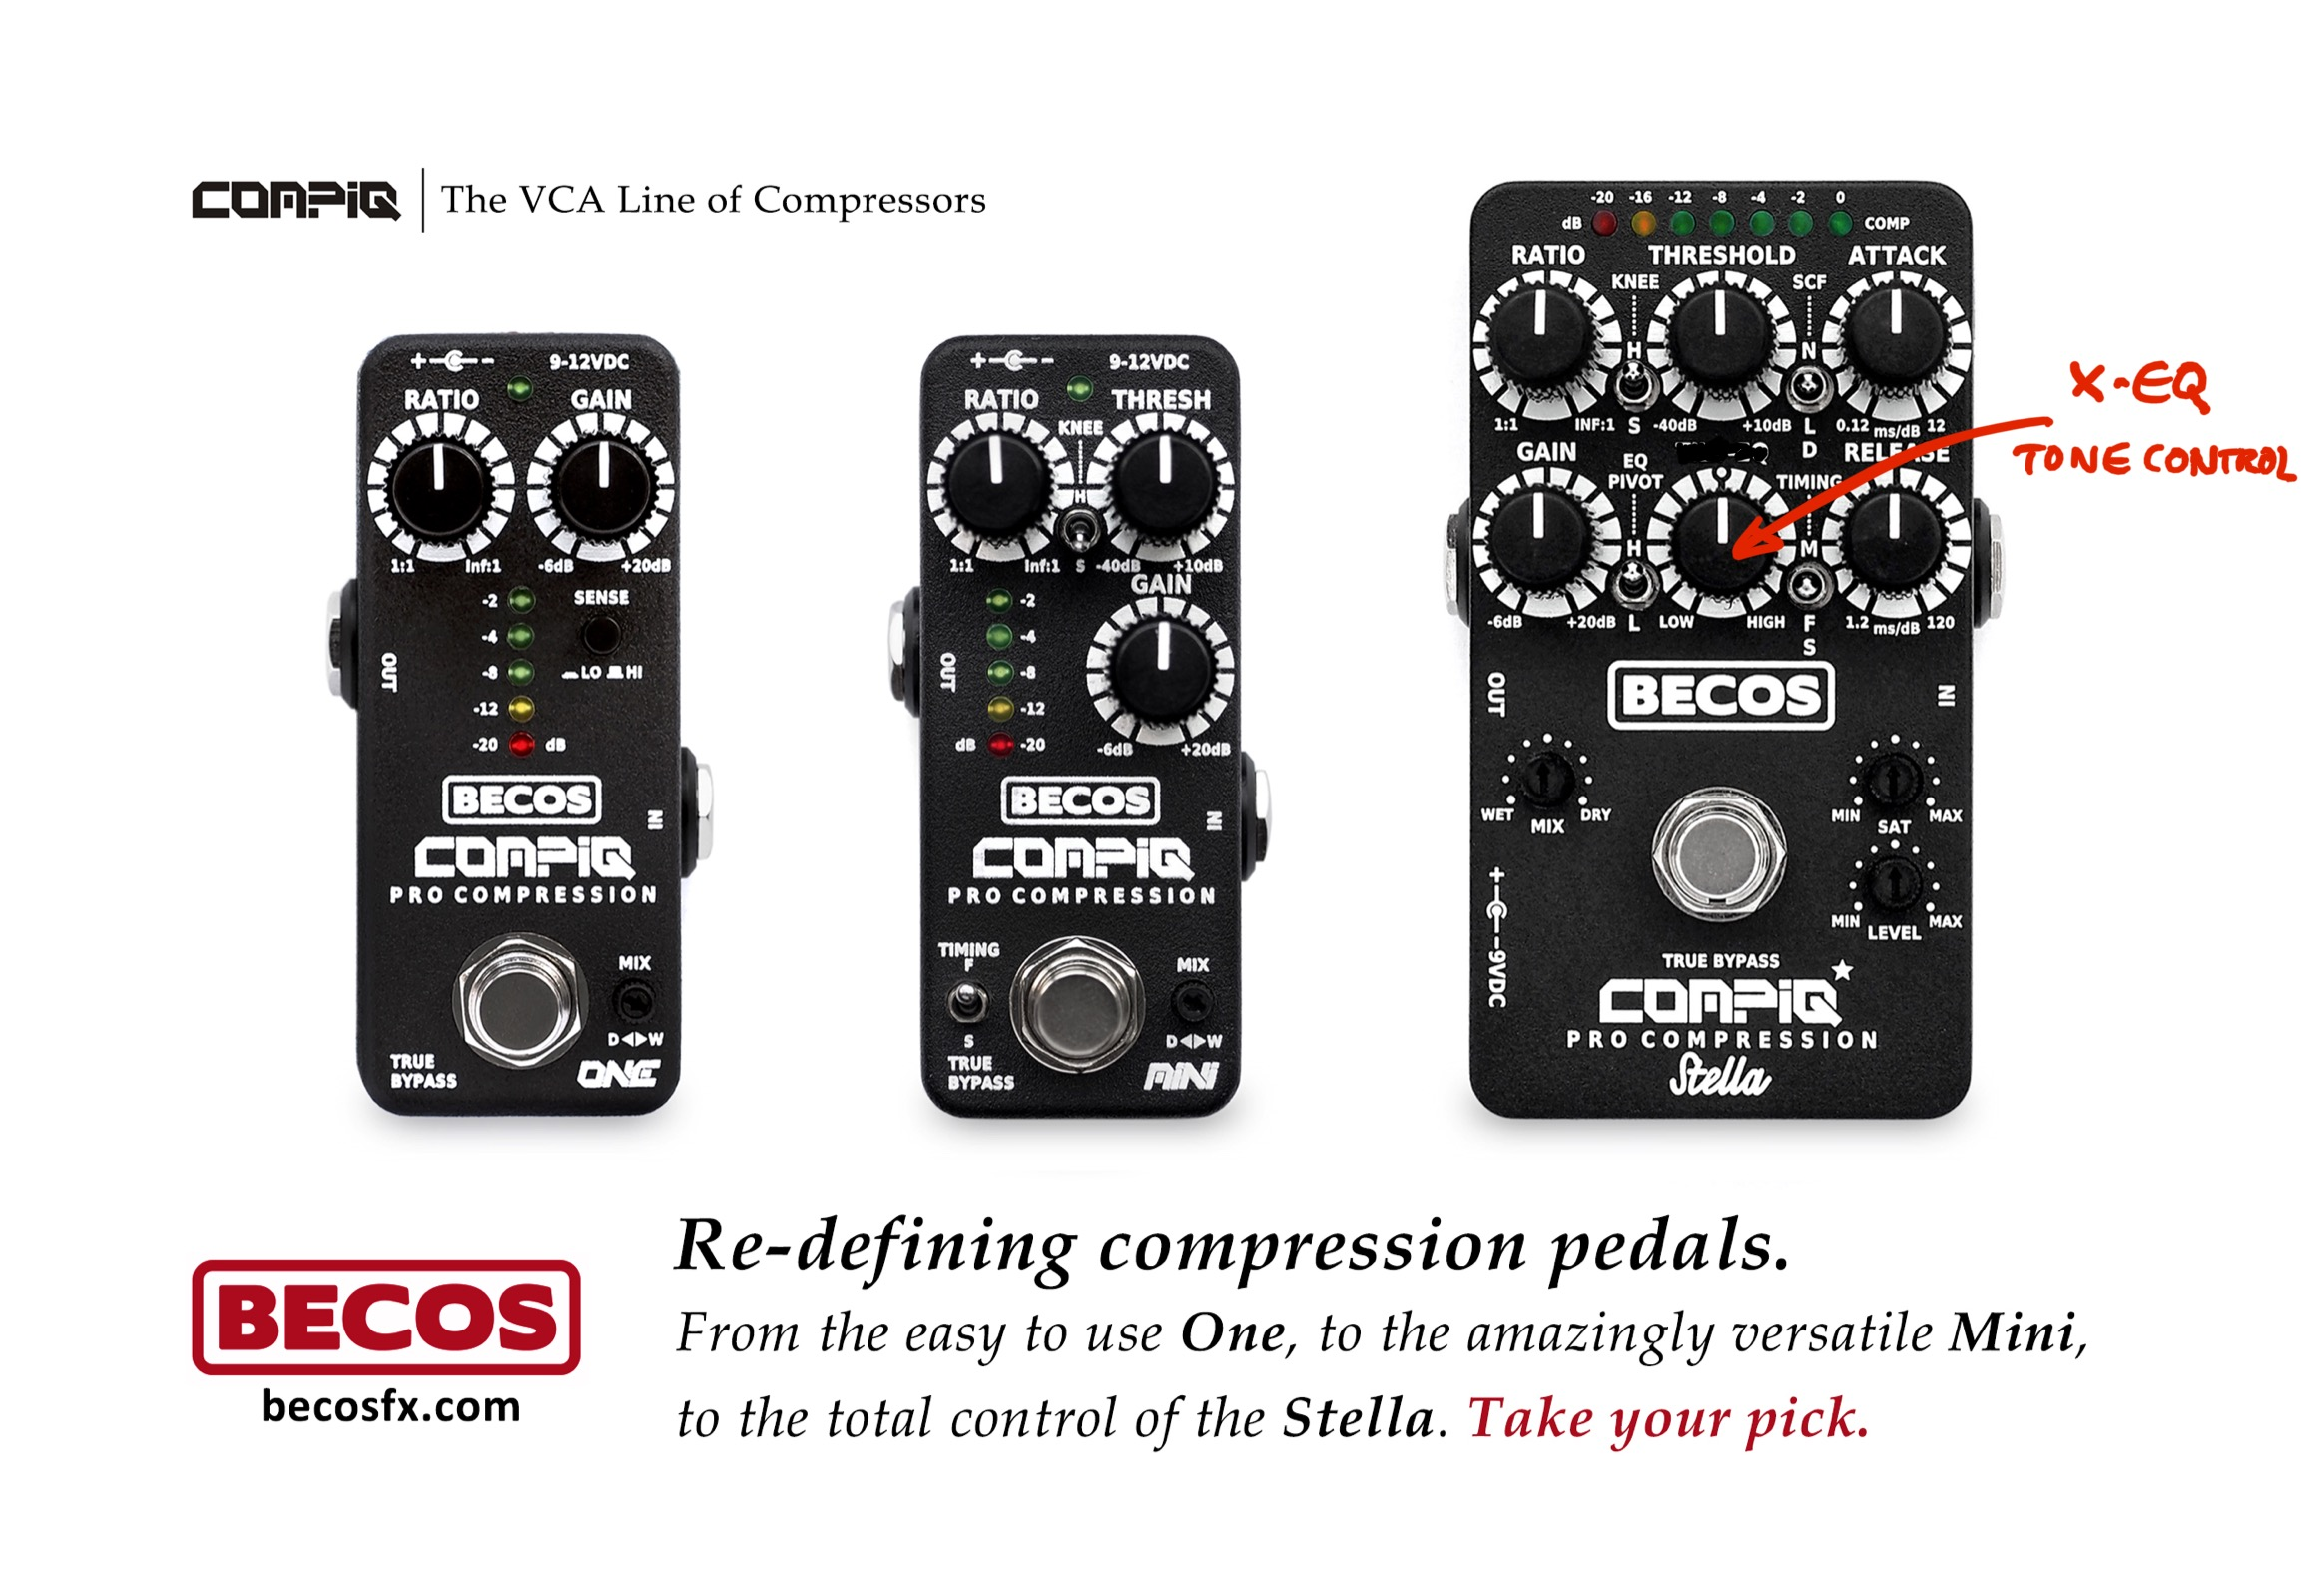 Becos CompIQ Line of Compressors